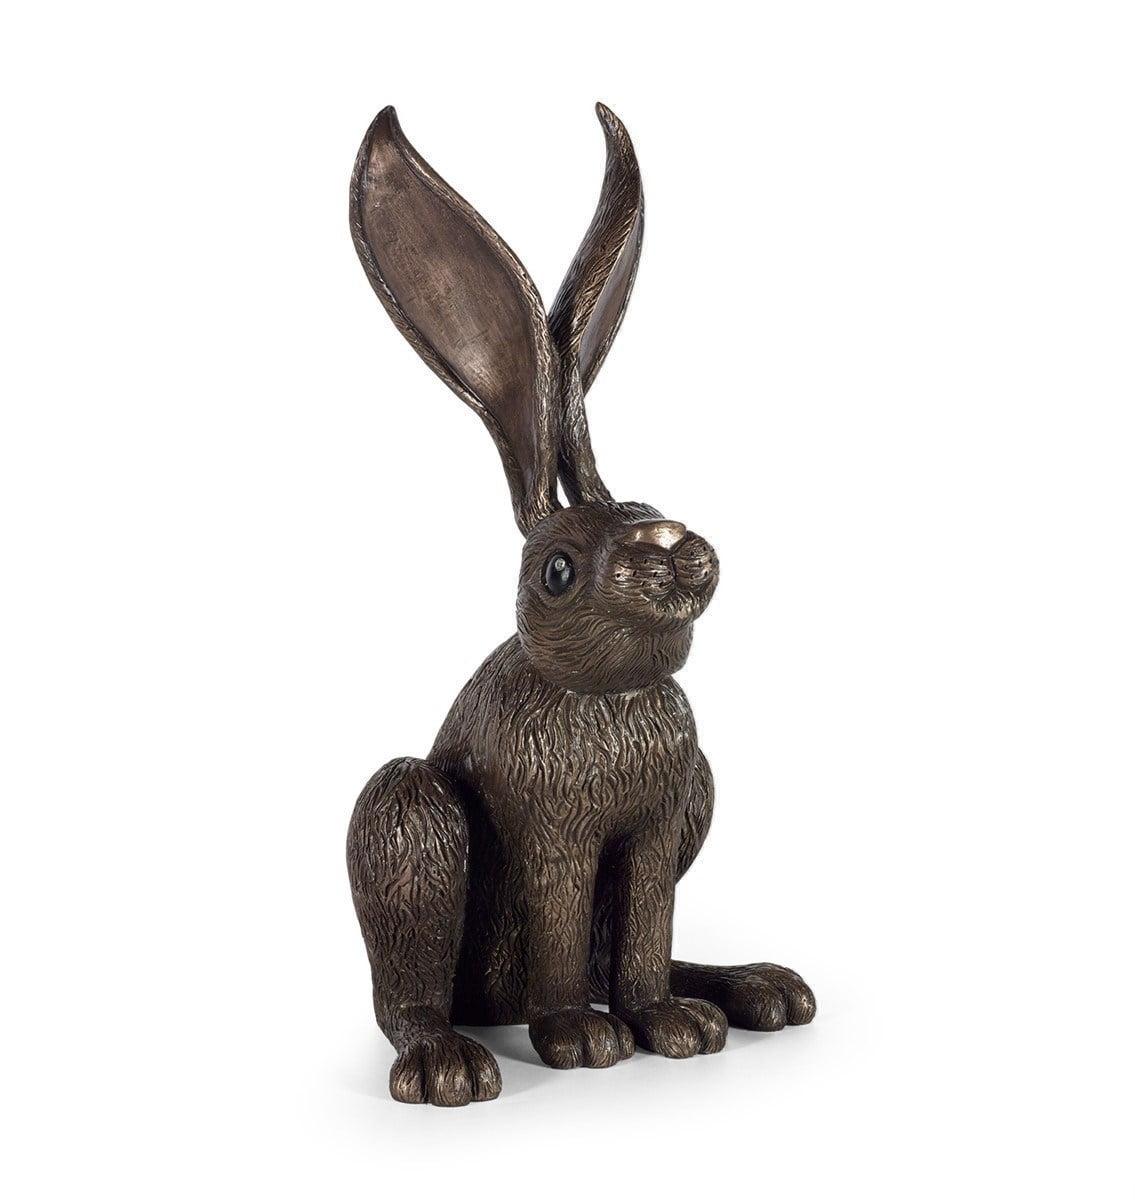 Hare's Looking at You ~ Jennifer Hogwood